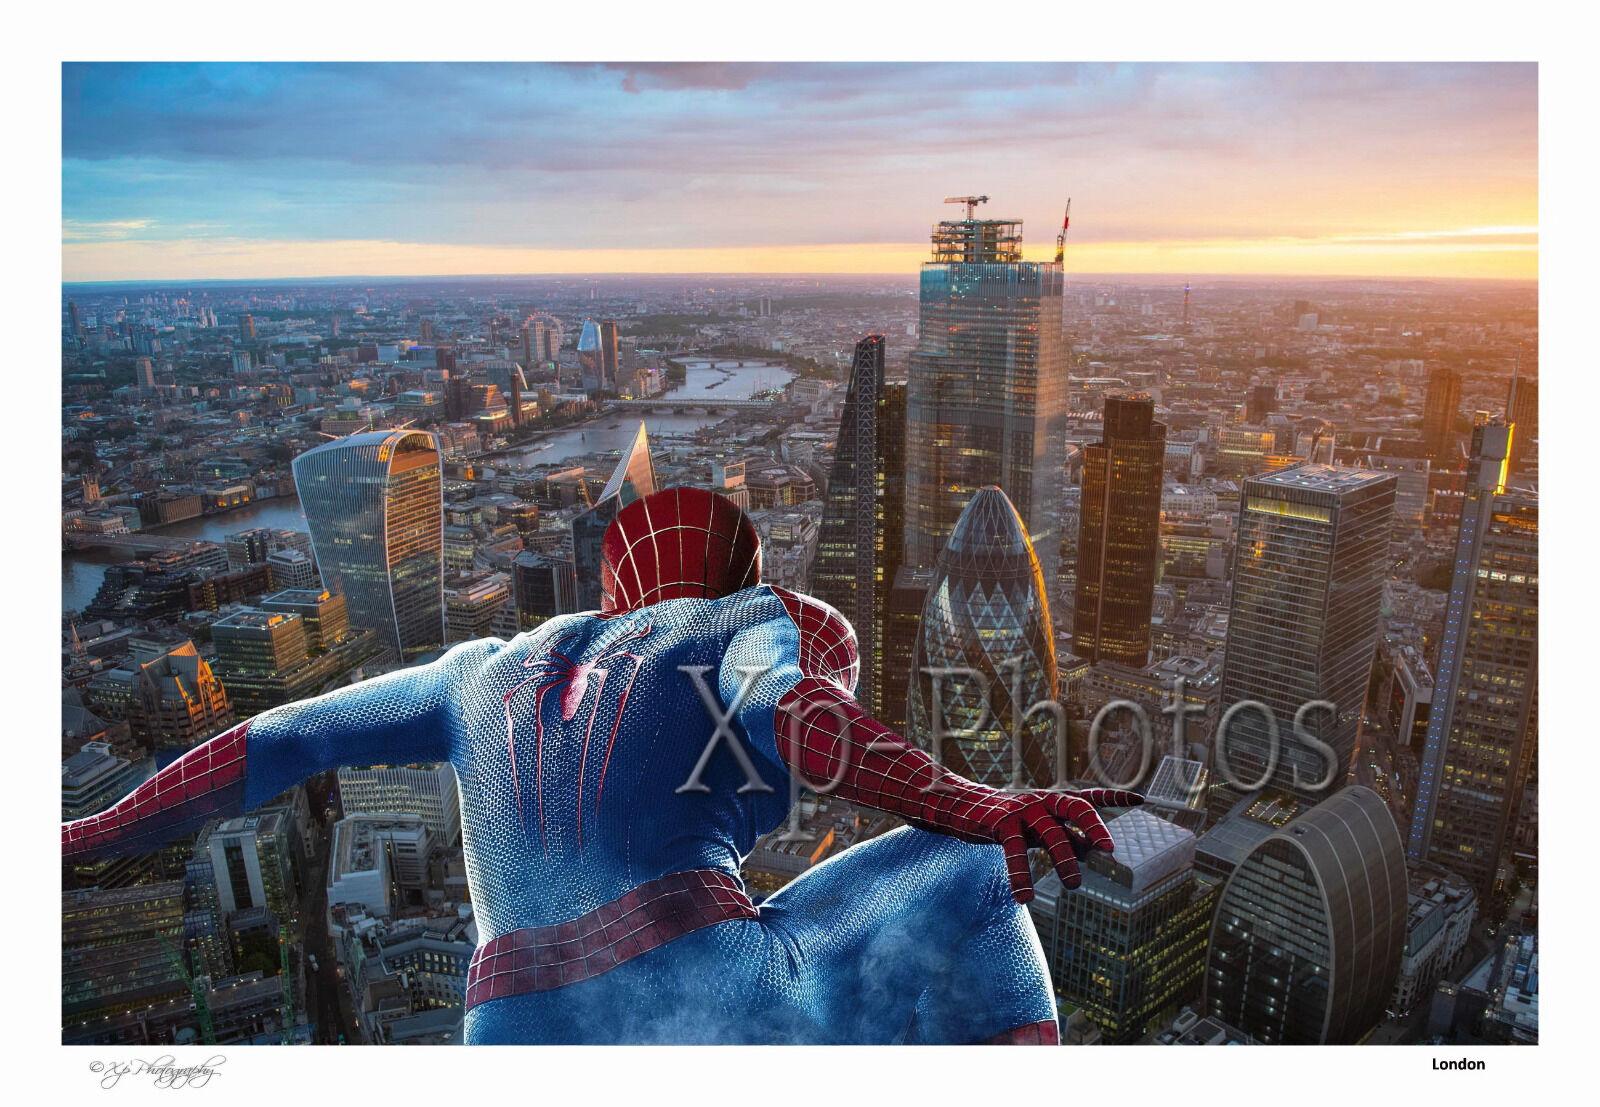 Spiderman @ London